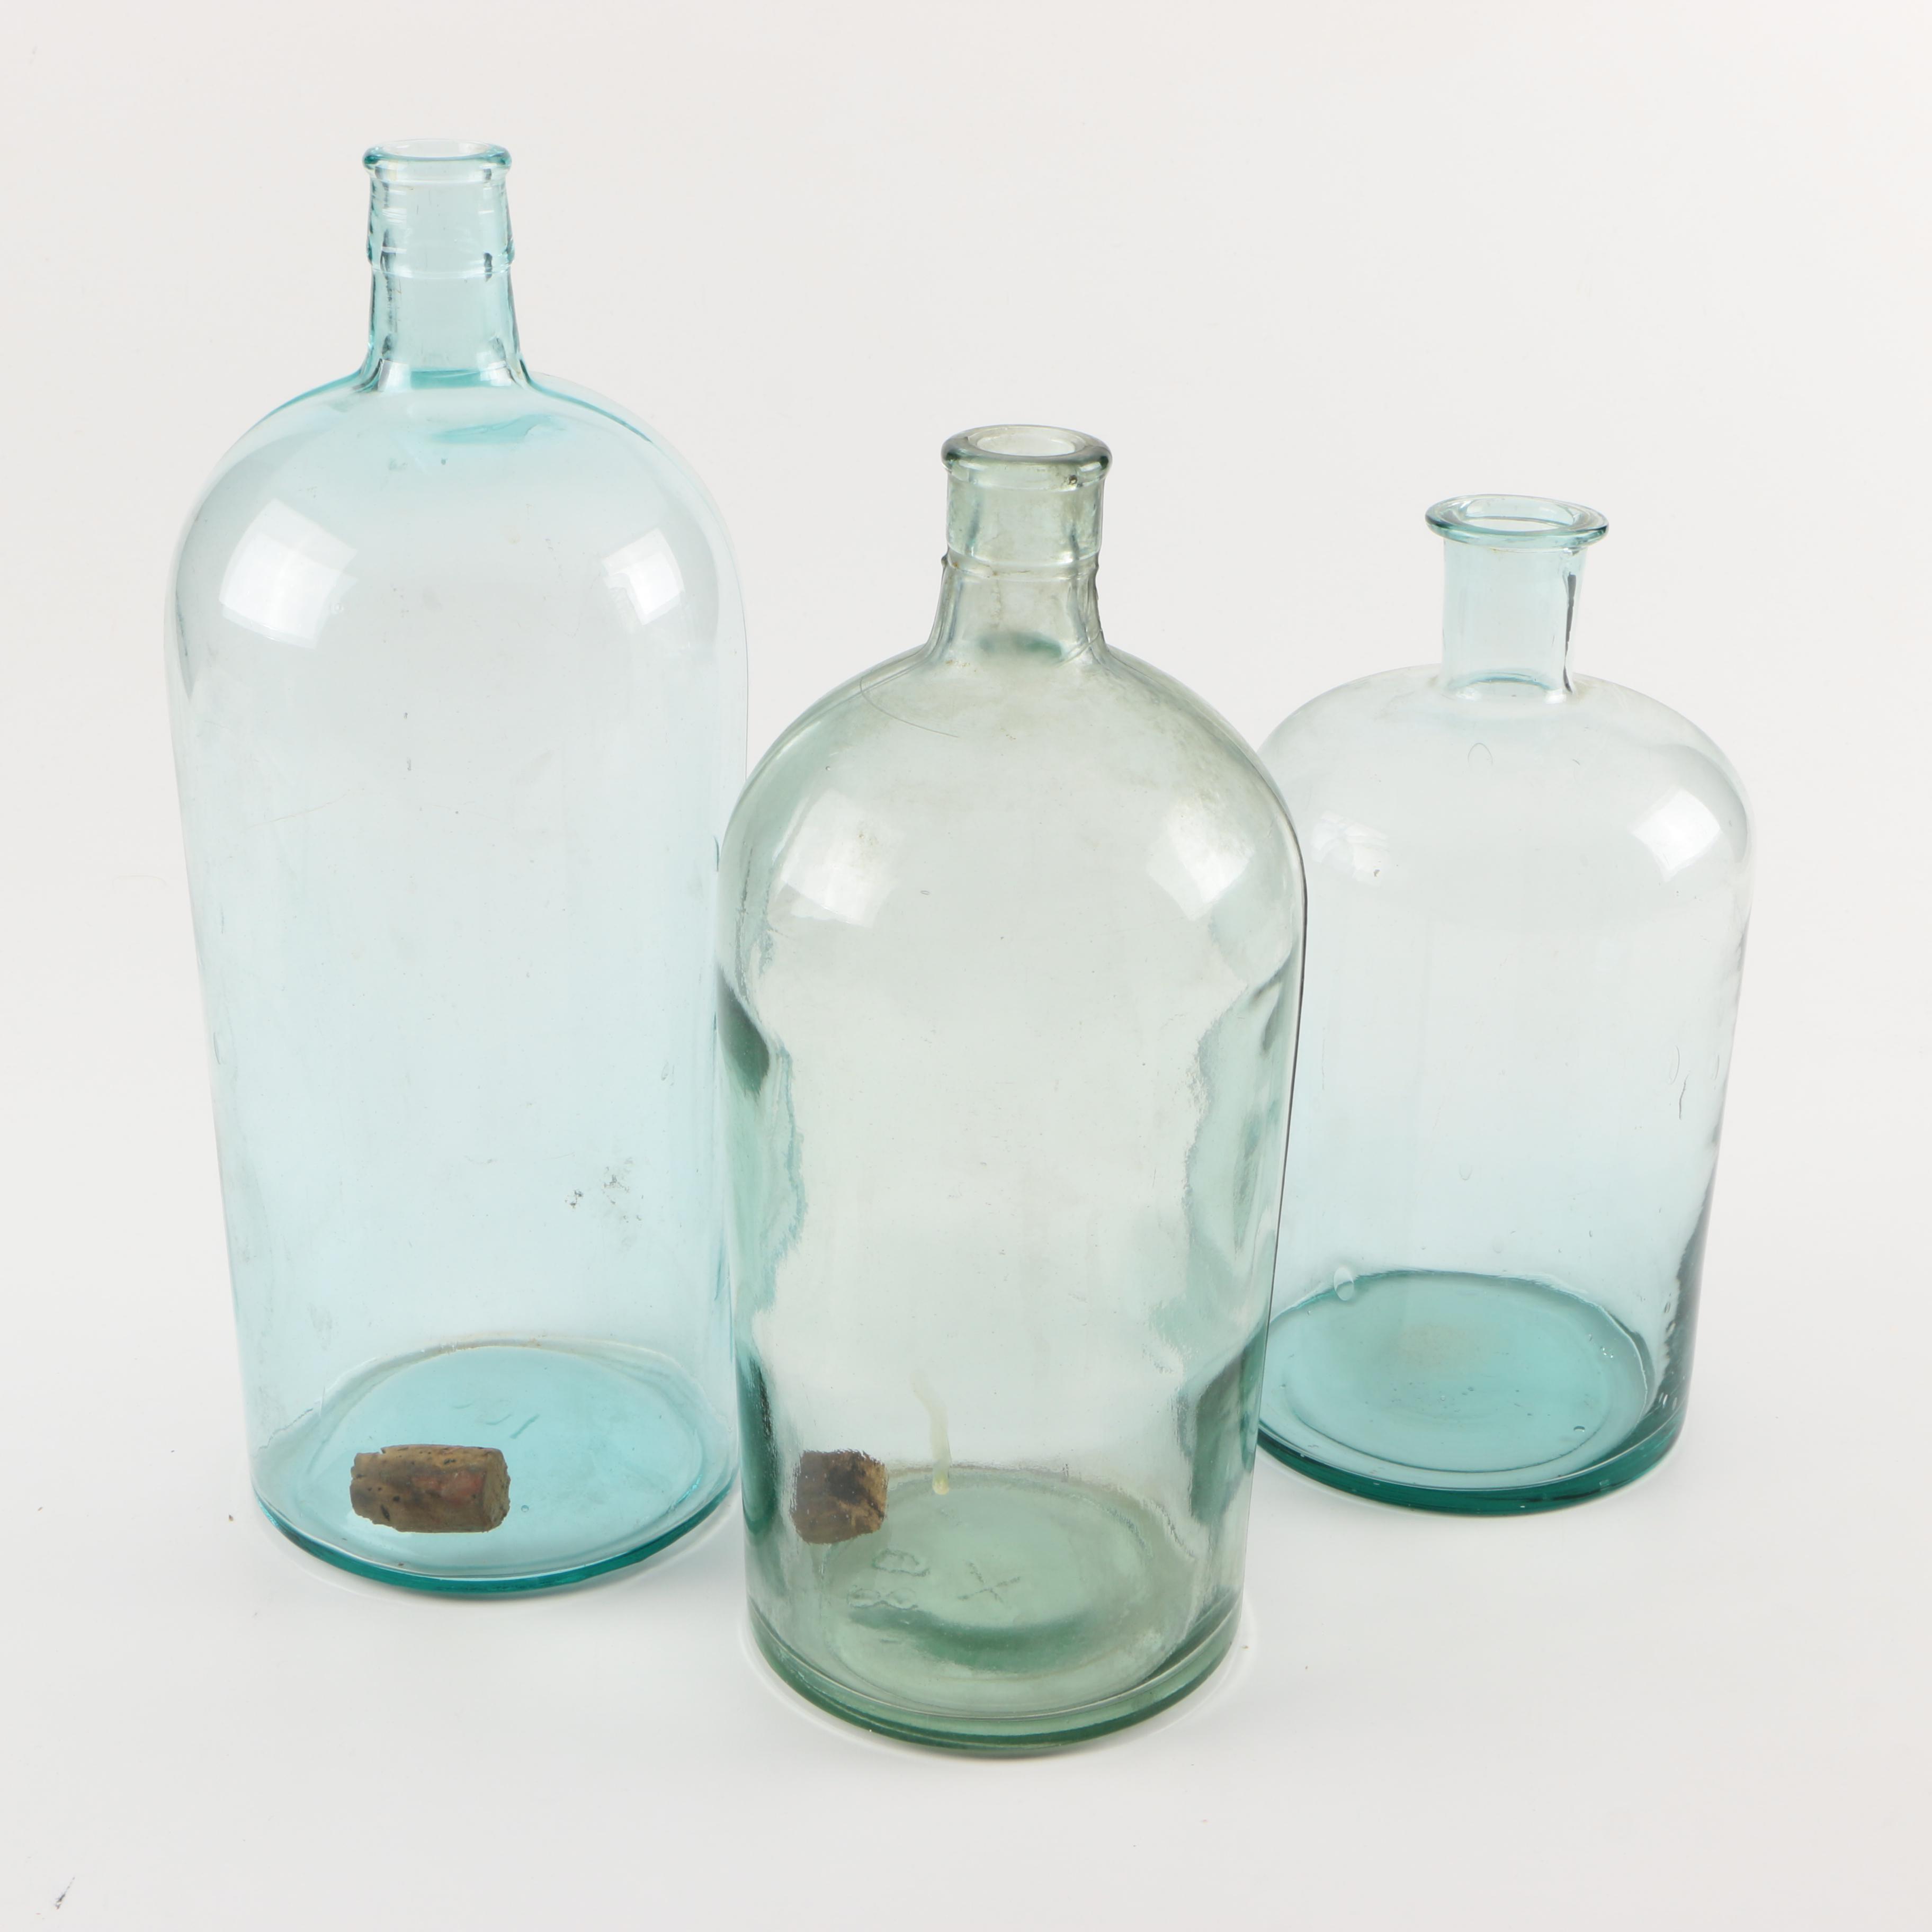 Decorative Glass Jugs